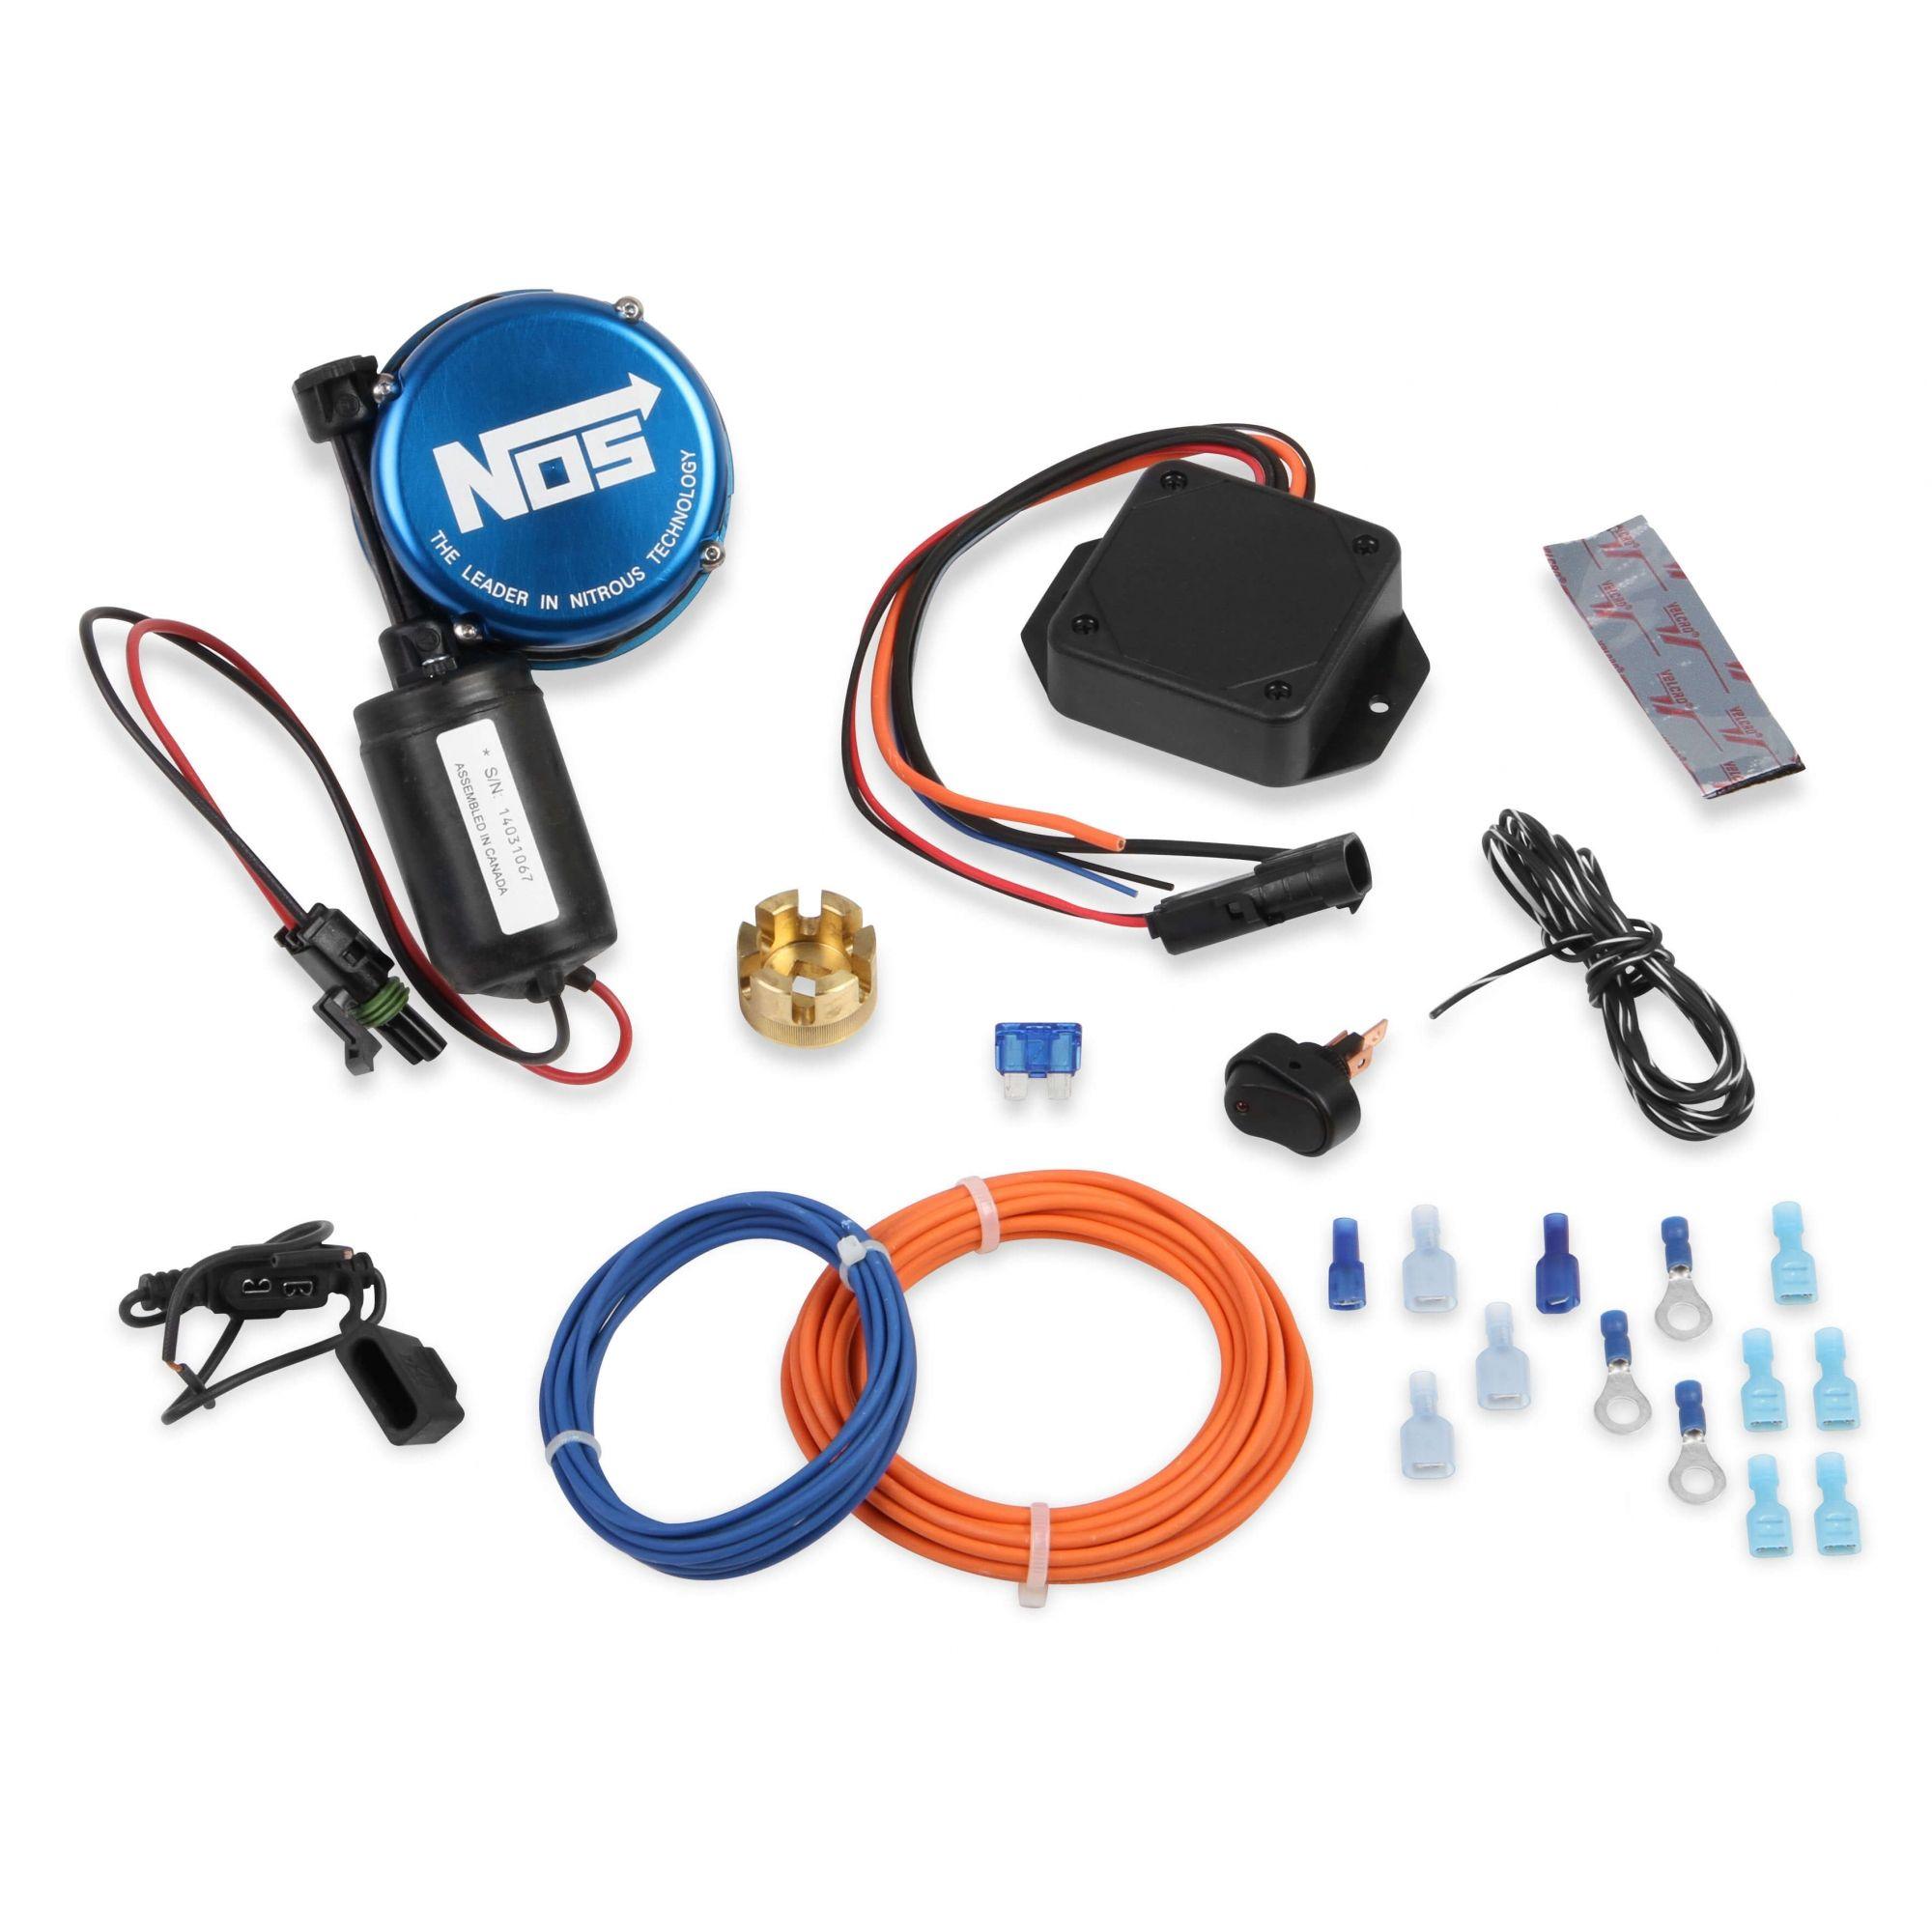 Sistema de Abertura/Fechamento de Cilindro de Nitro Remoto - NOS  - PRO-1 Serious Performance